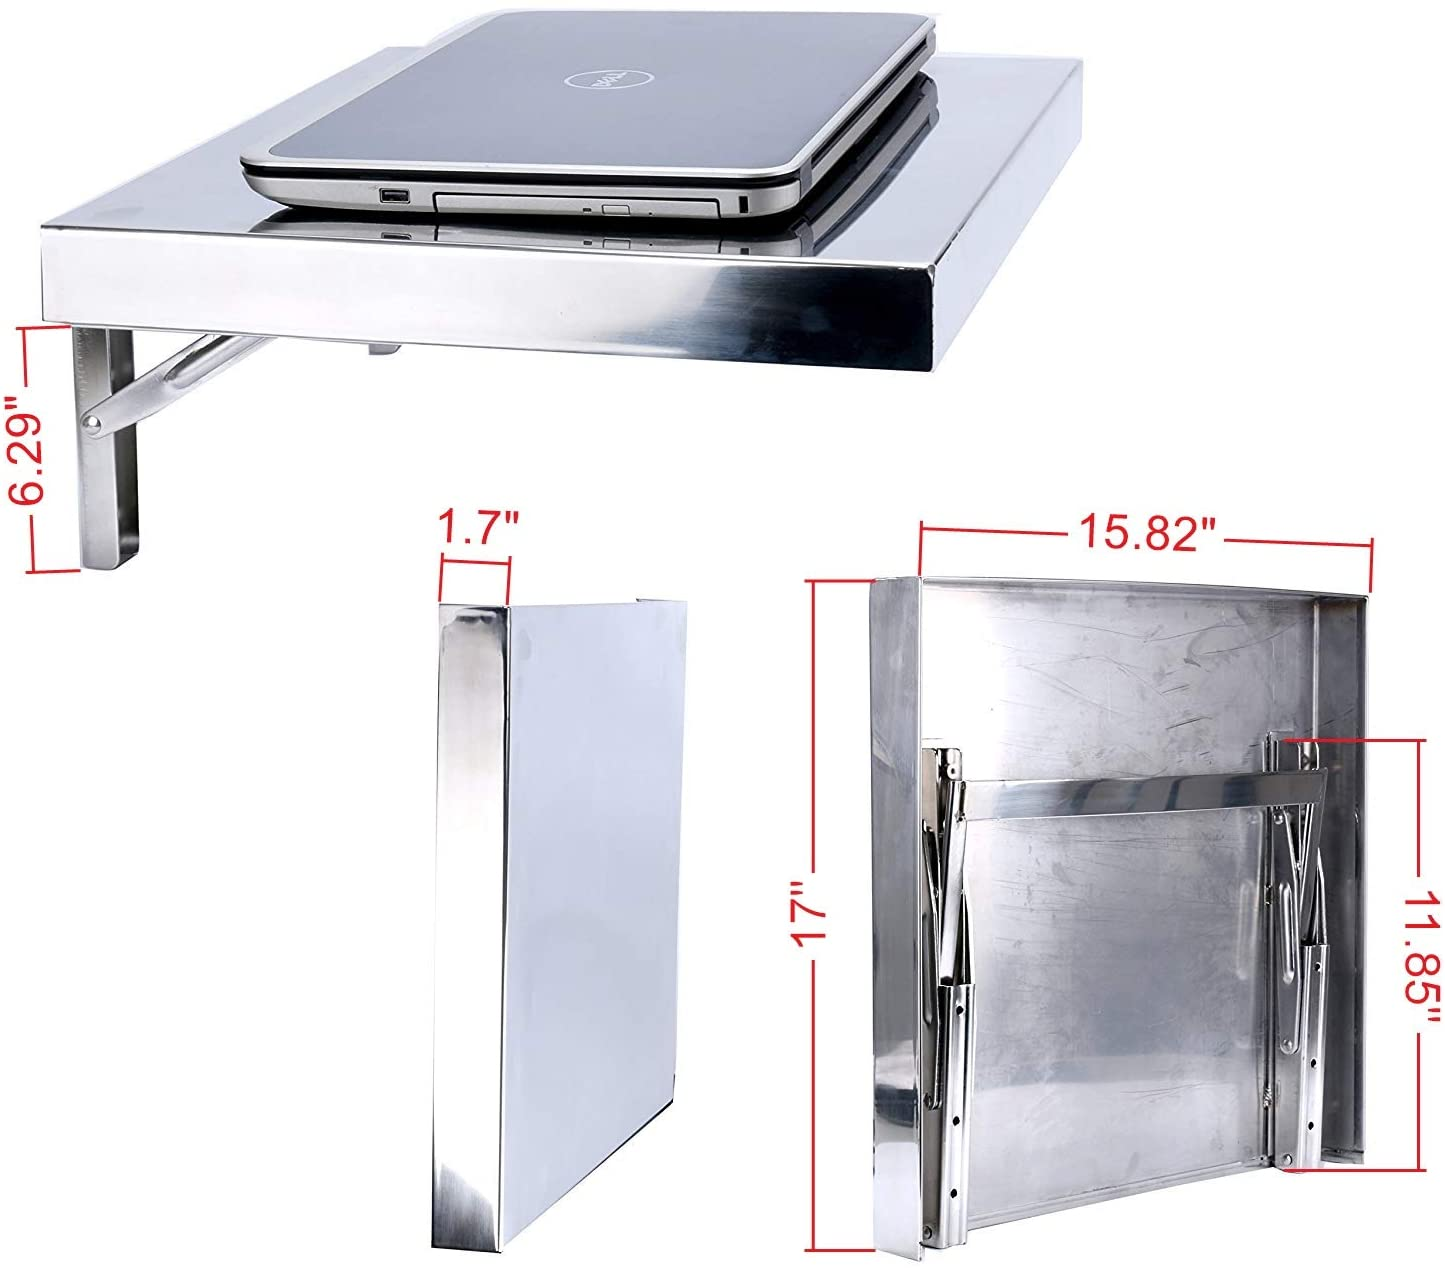 Amarine Made Workstation, Stainless, Wall-Mount Folding, Laptop,PC Desk